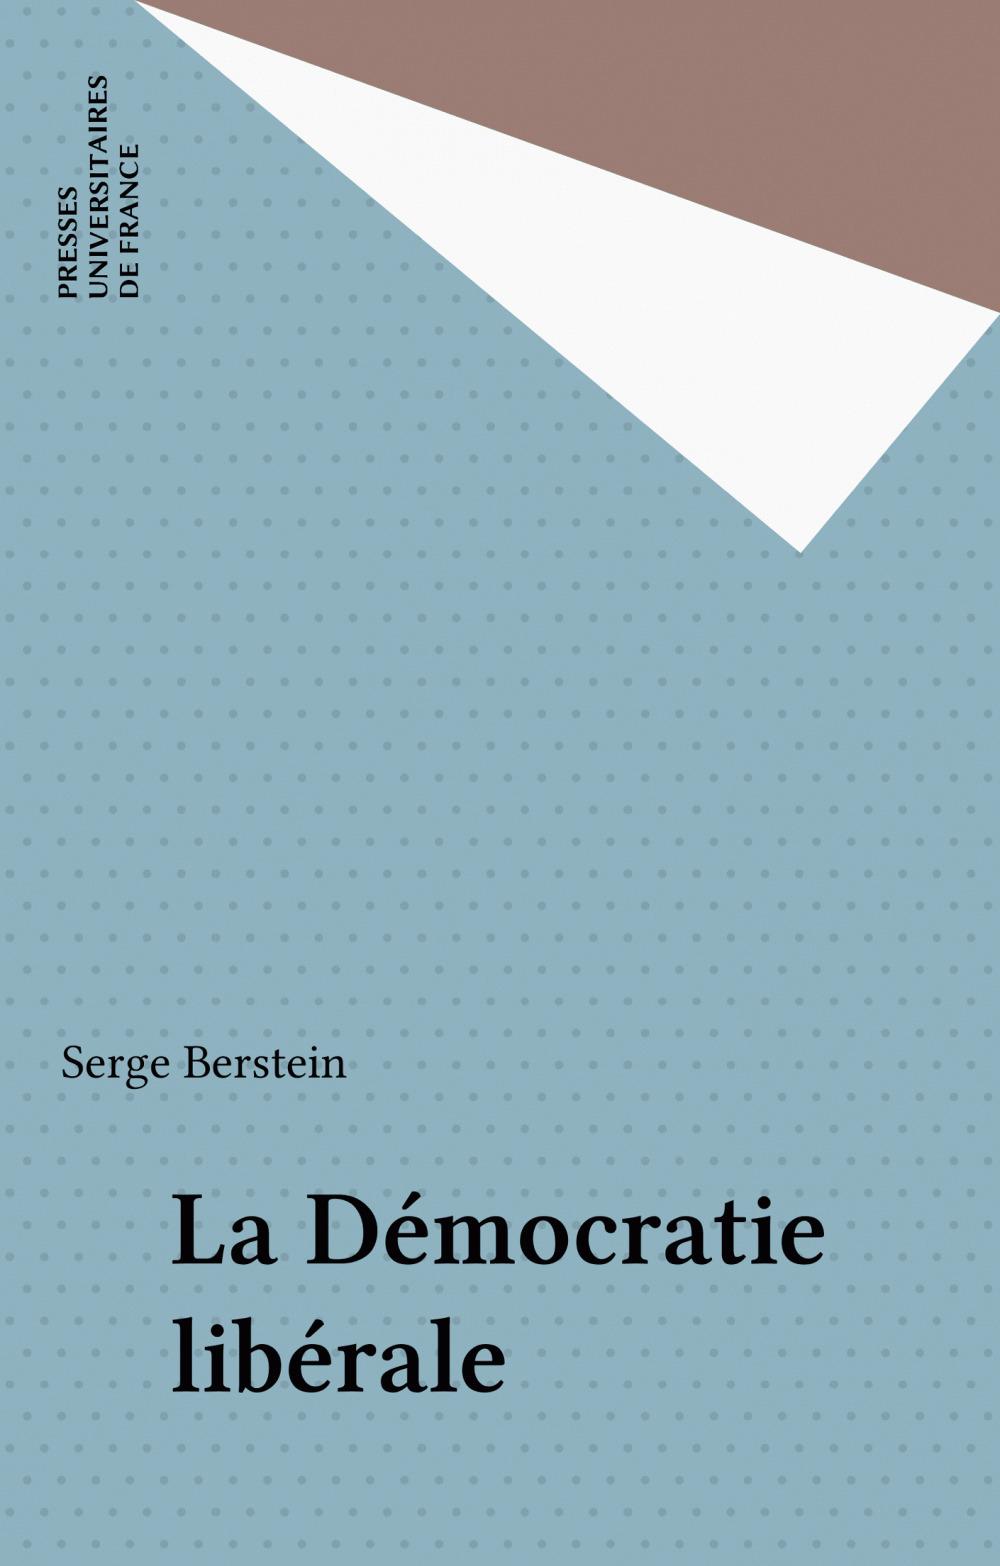 La democratie liberale